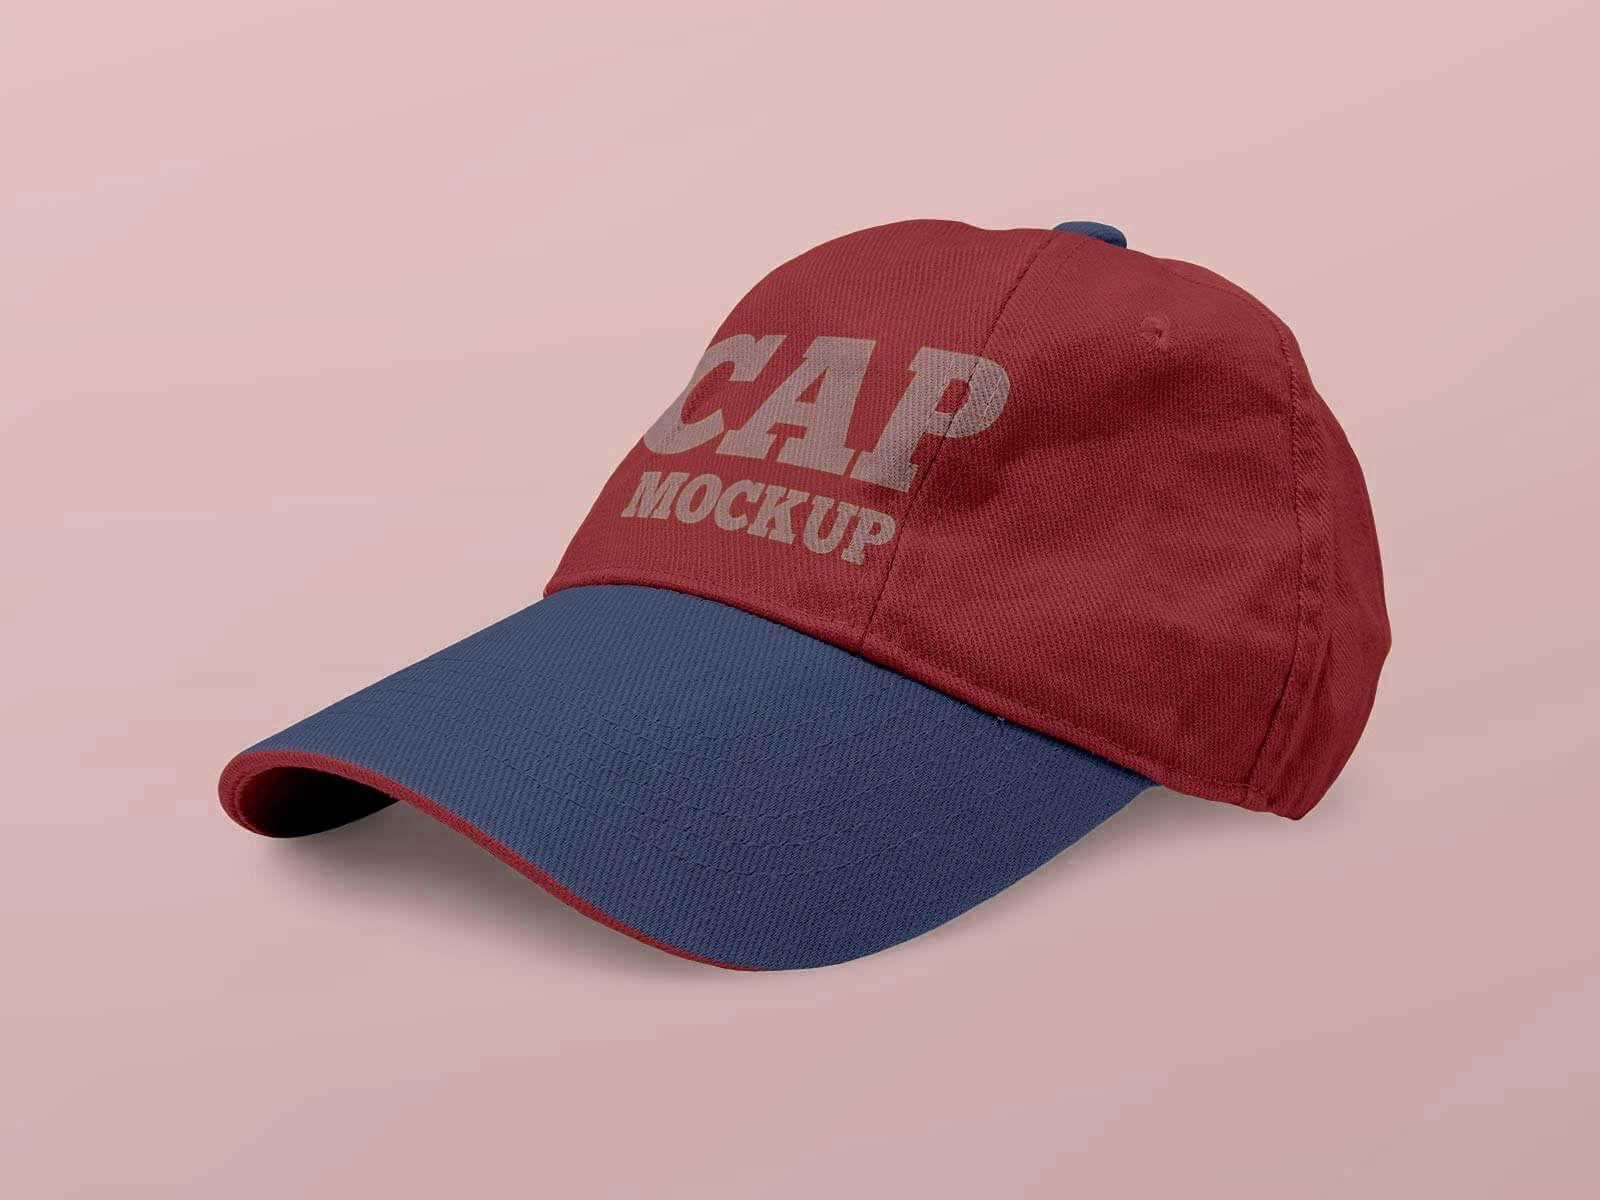 Download 2 Free Curved Cap Mockups Psd Set Mockup Psd Mockup Psd Template Free